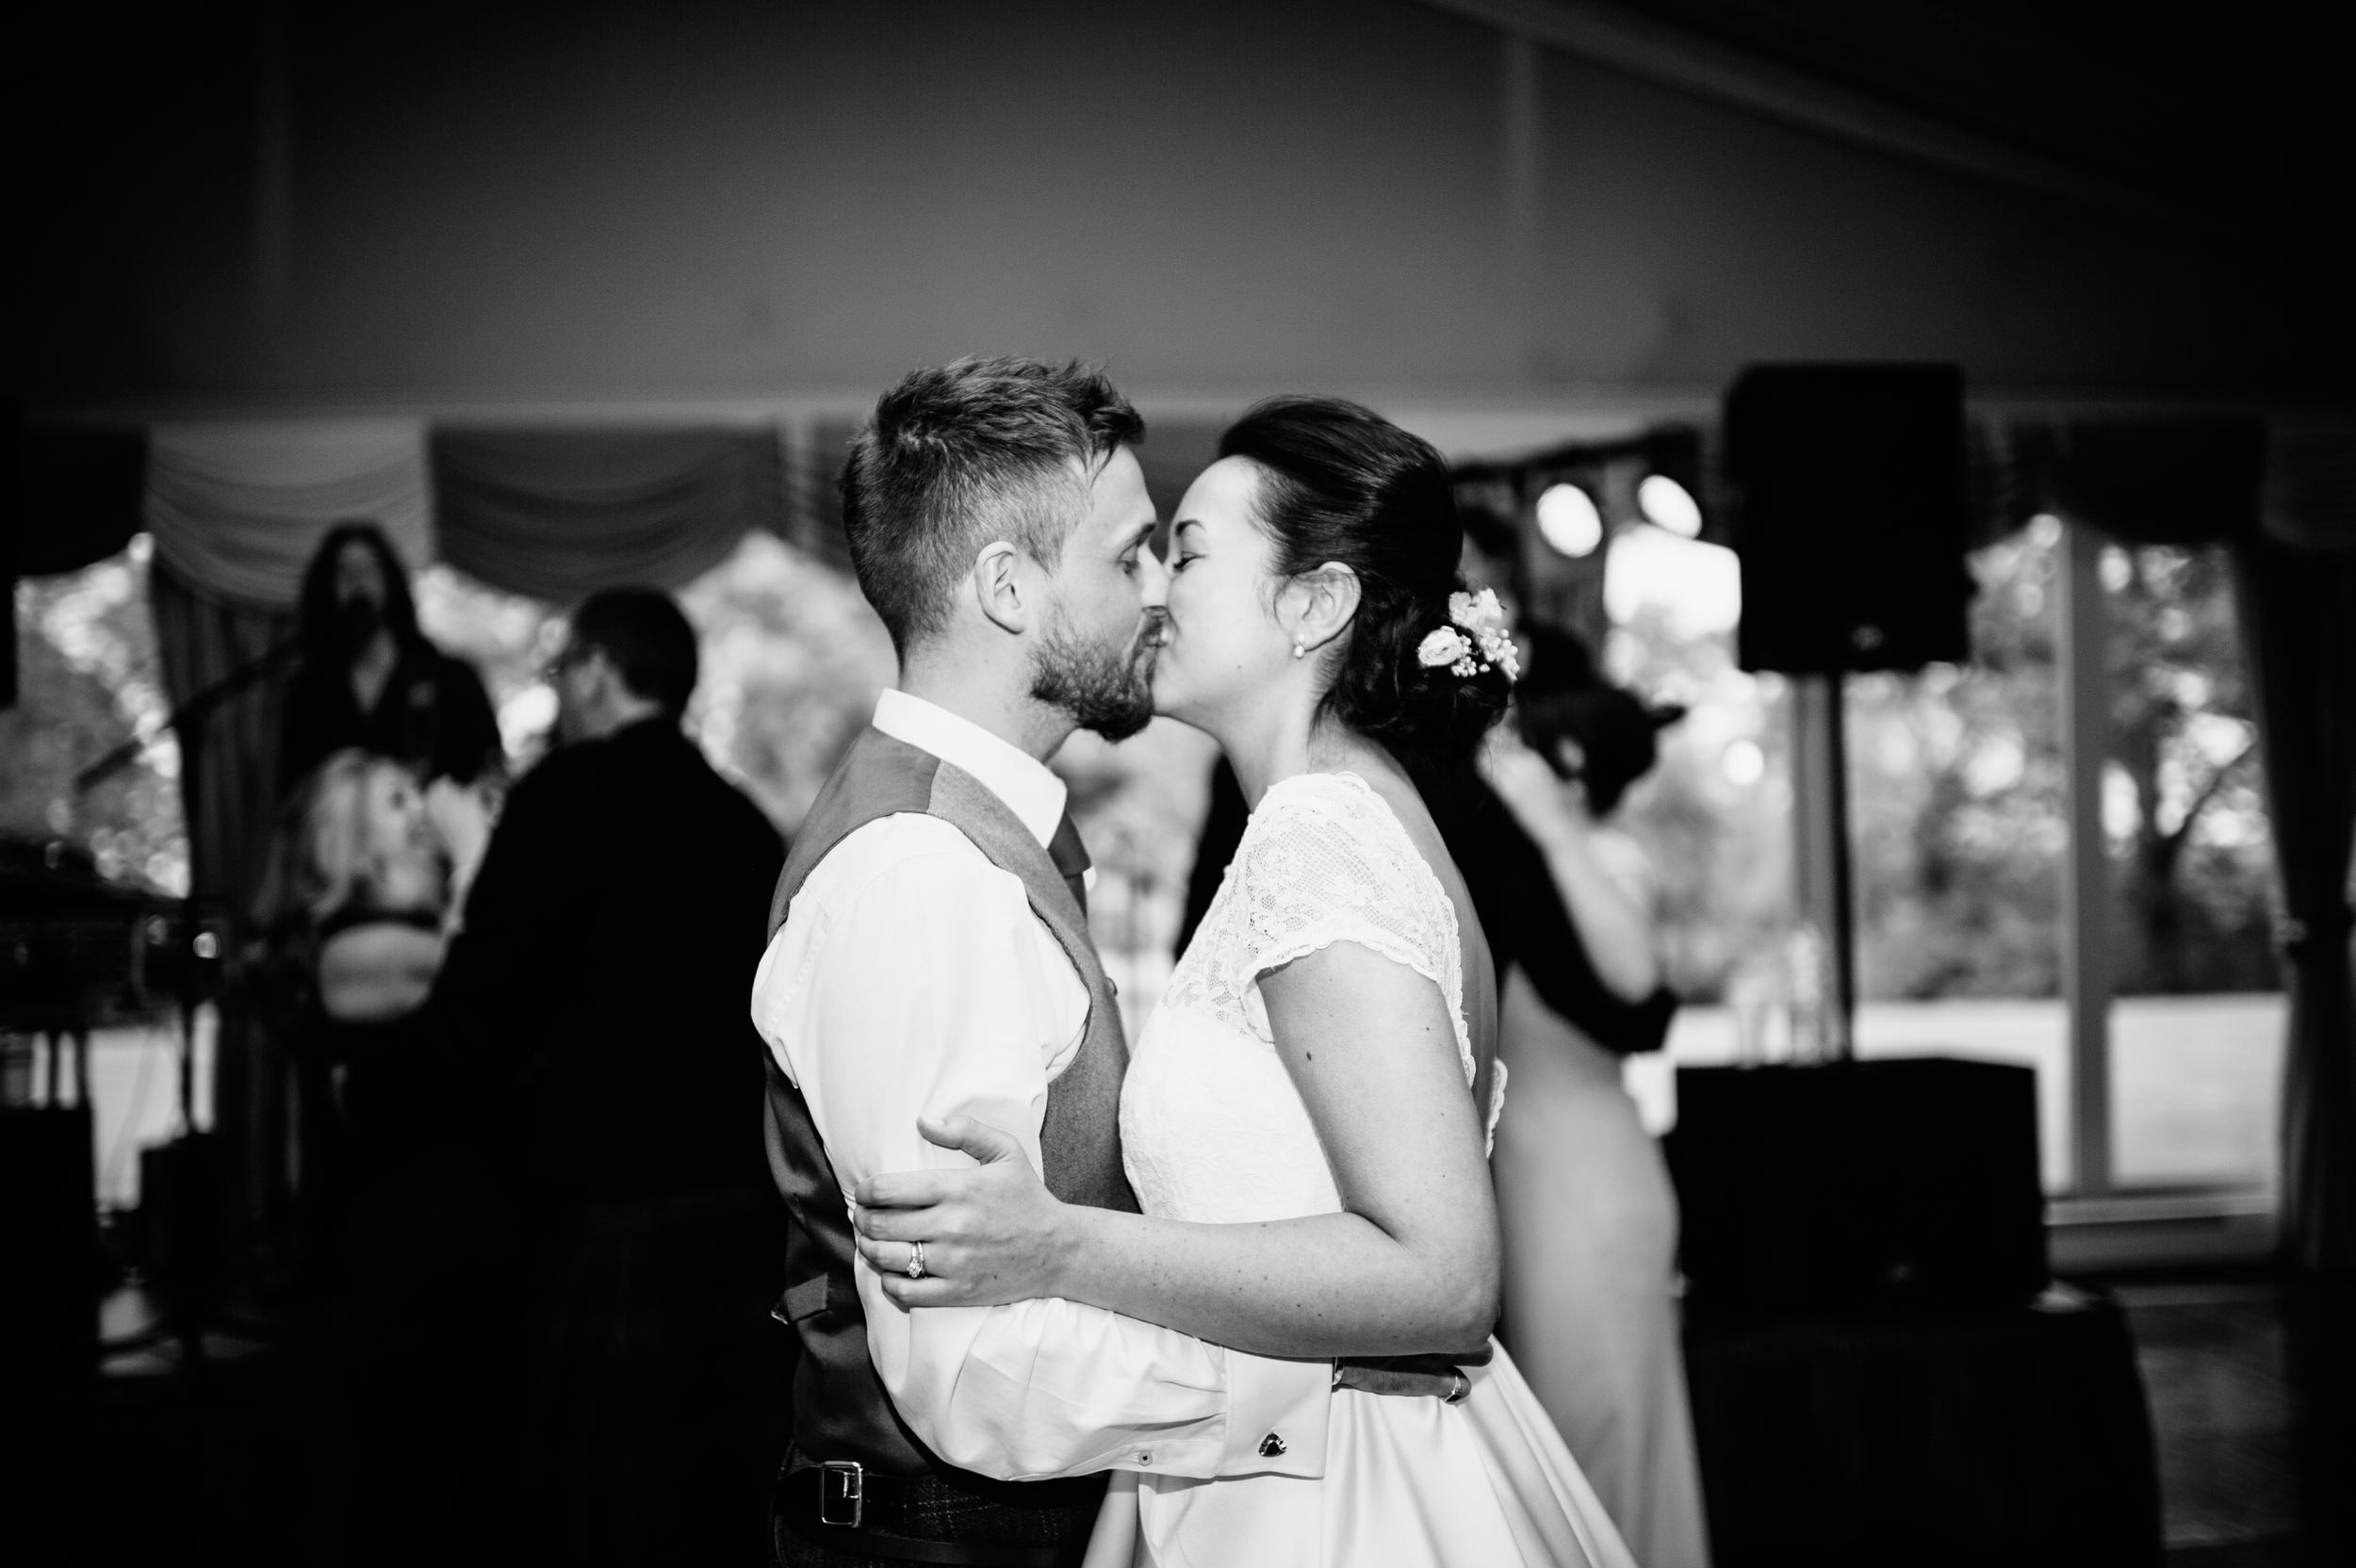 0185-lisa-devine-alternative-creative-wedding-photography-glasgow-edinburgh.JPG